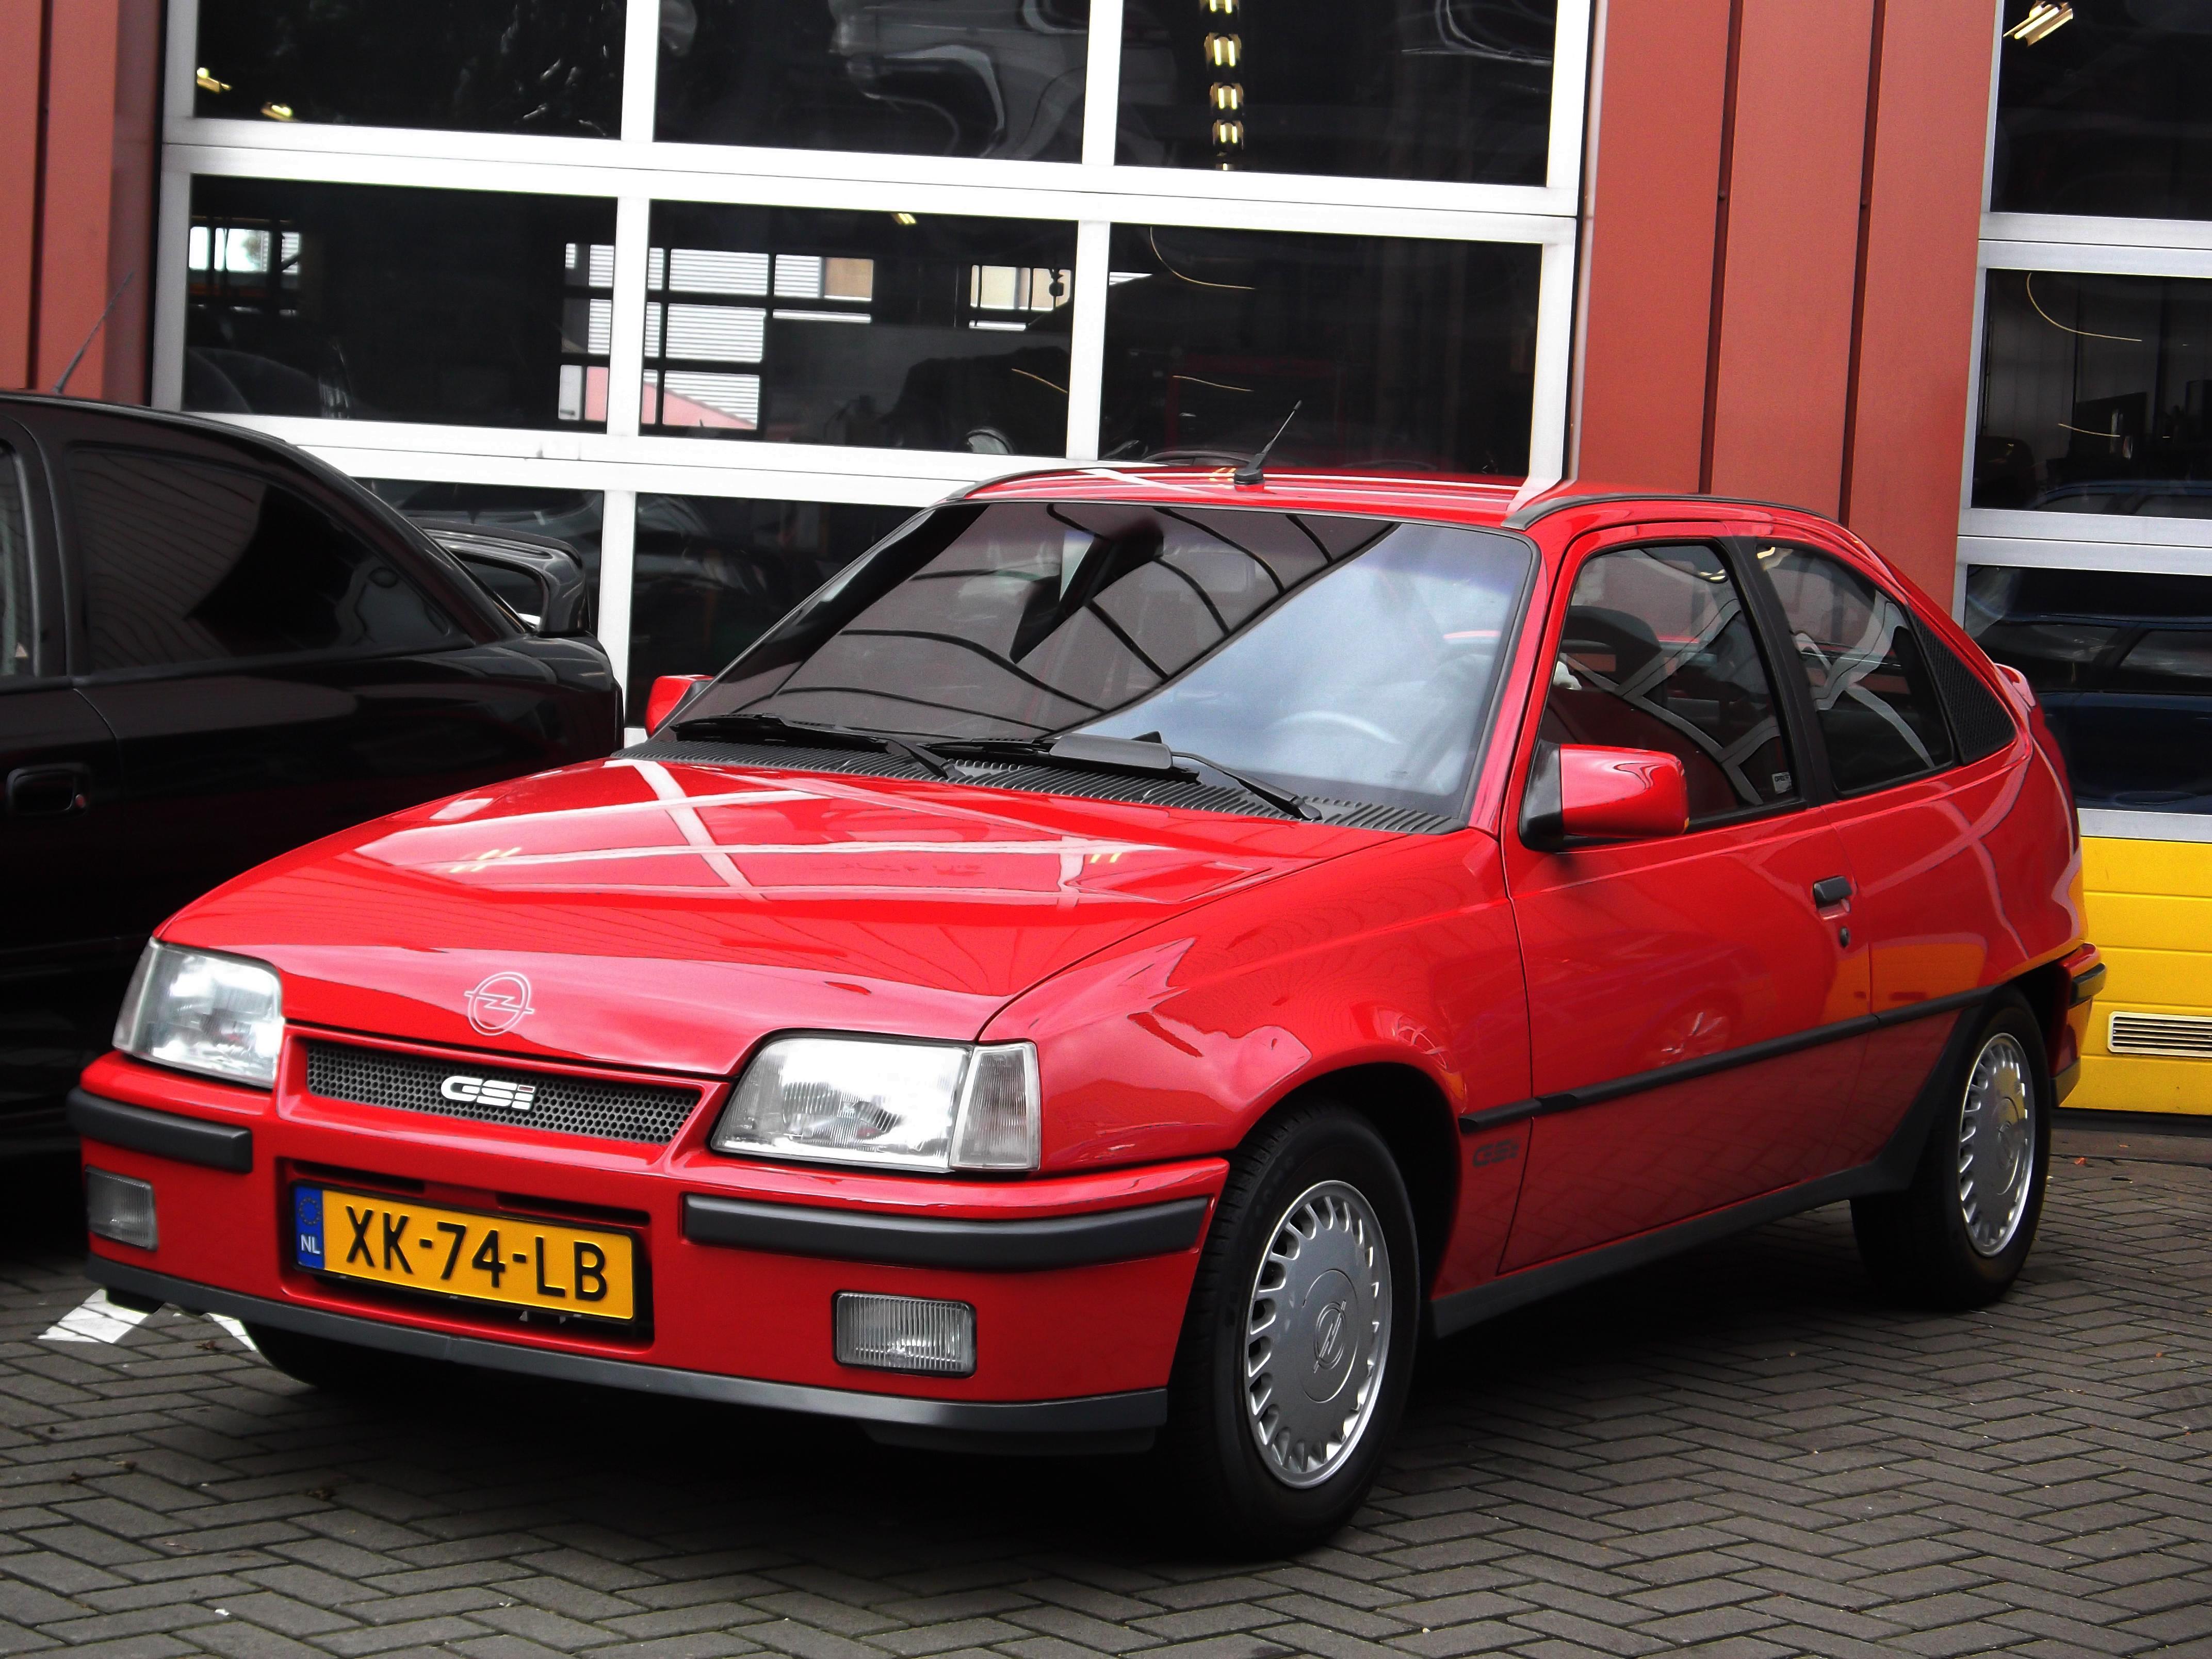 Opel kadett gsi gallery for Opel kadett e interieur